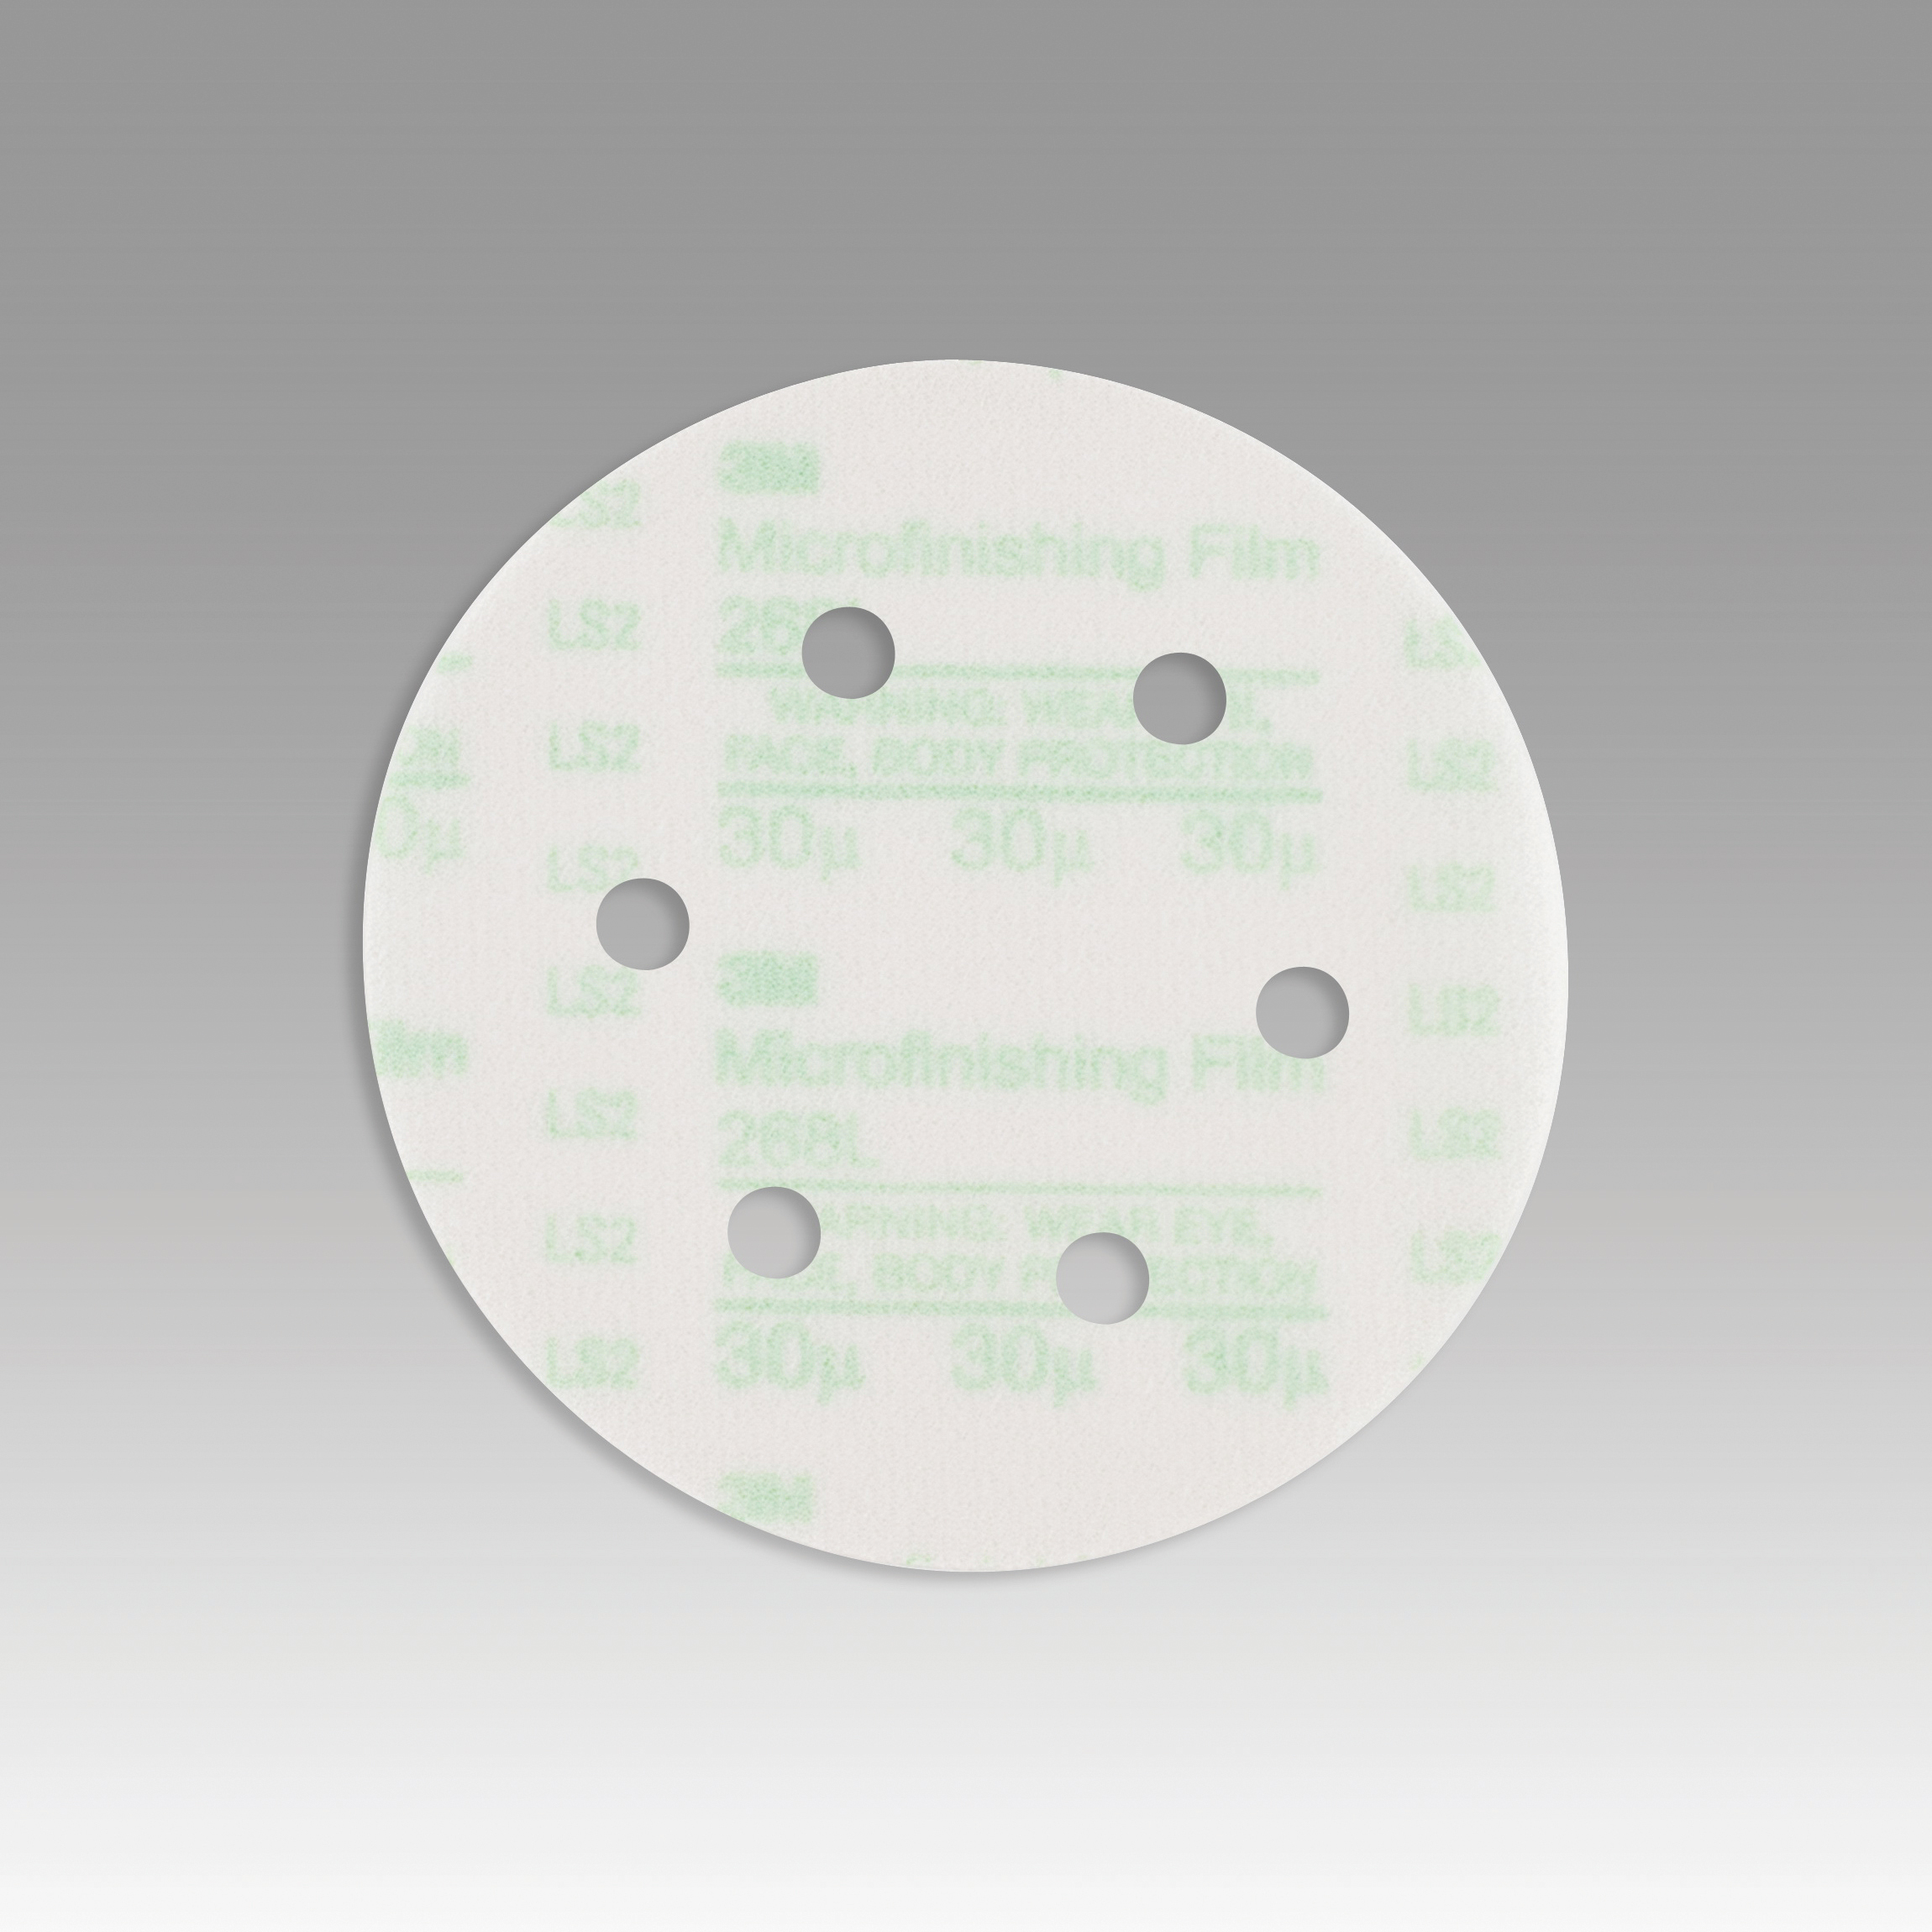 3M™ Hookit™ 051111-54554 268L Type D Microfinishing Orbital Sanding Disc, 6 in Dia Disc, 30 micron Grit, Extra Fine Grade, Aluminum Oxide Abrasive, Polyester Film Backing